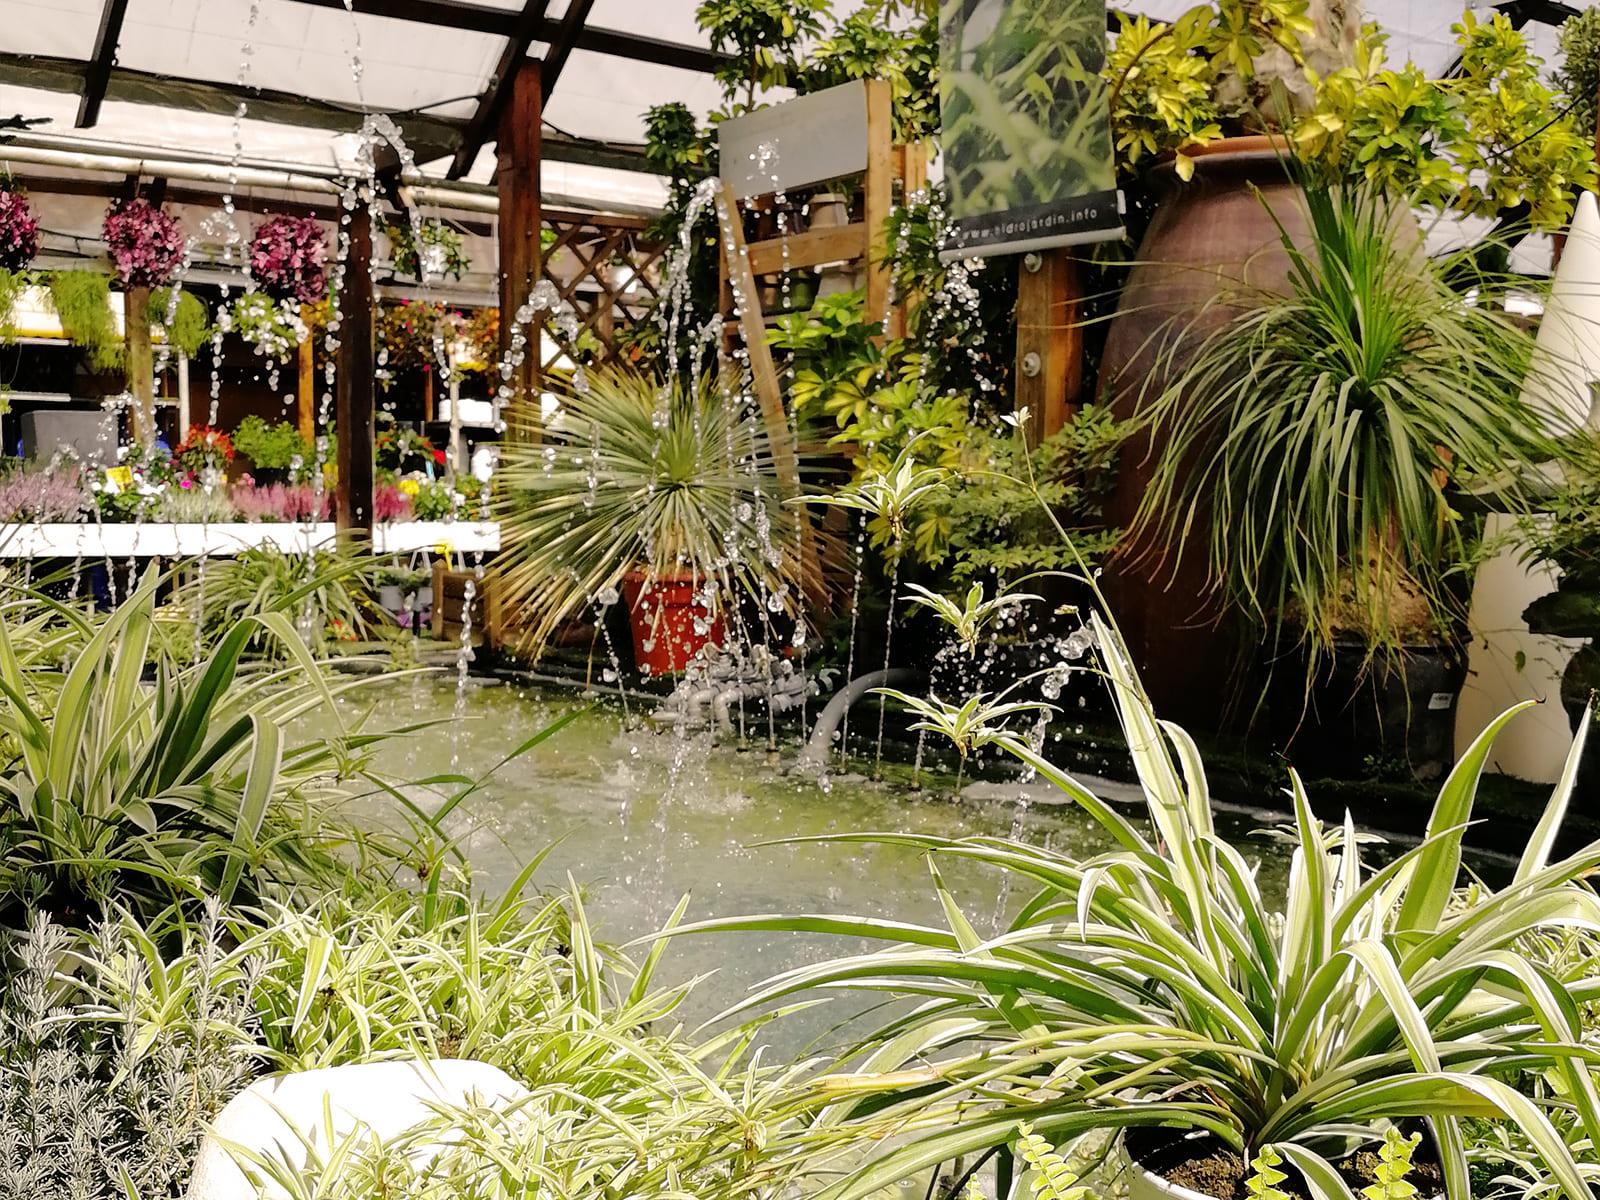 centro-jardineria-garden-invernadero-artesanal-madera-fuente-12_HIDROJARDIN-Bañeres